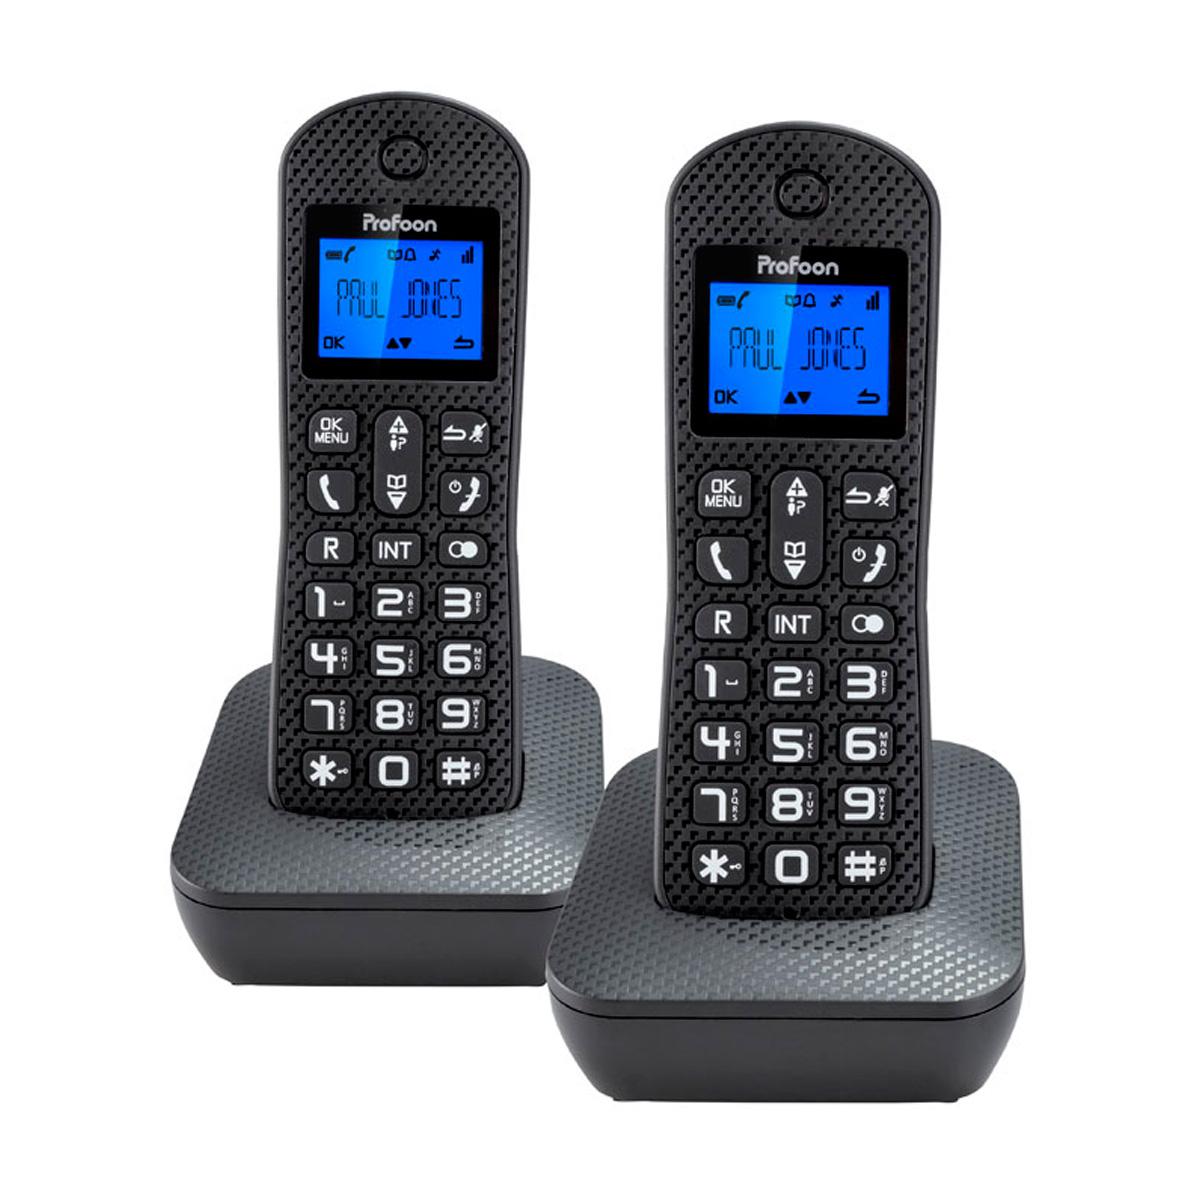 Telefono duo pdx 520zt inalambrico for Telefono oficina